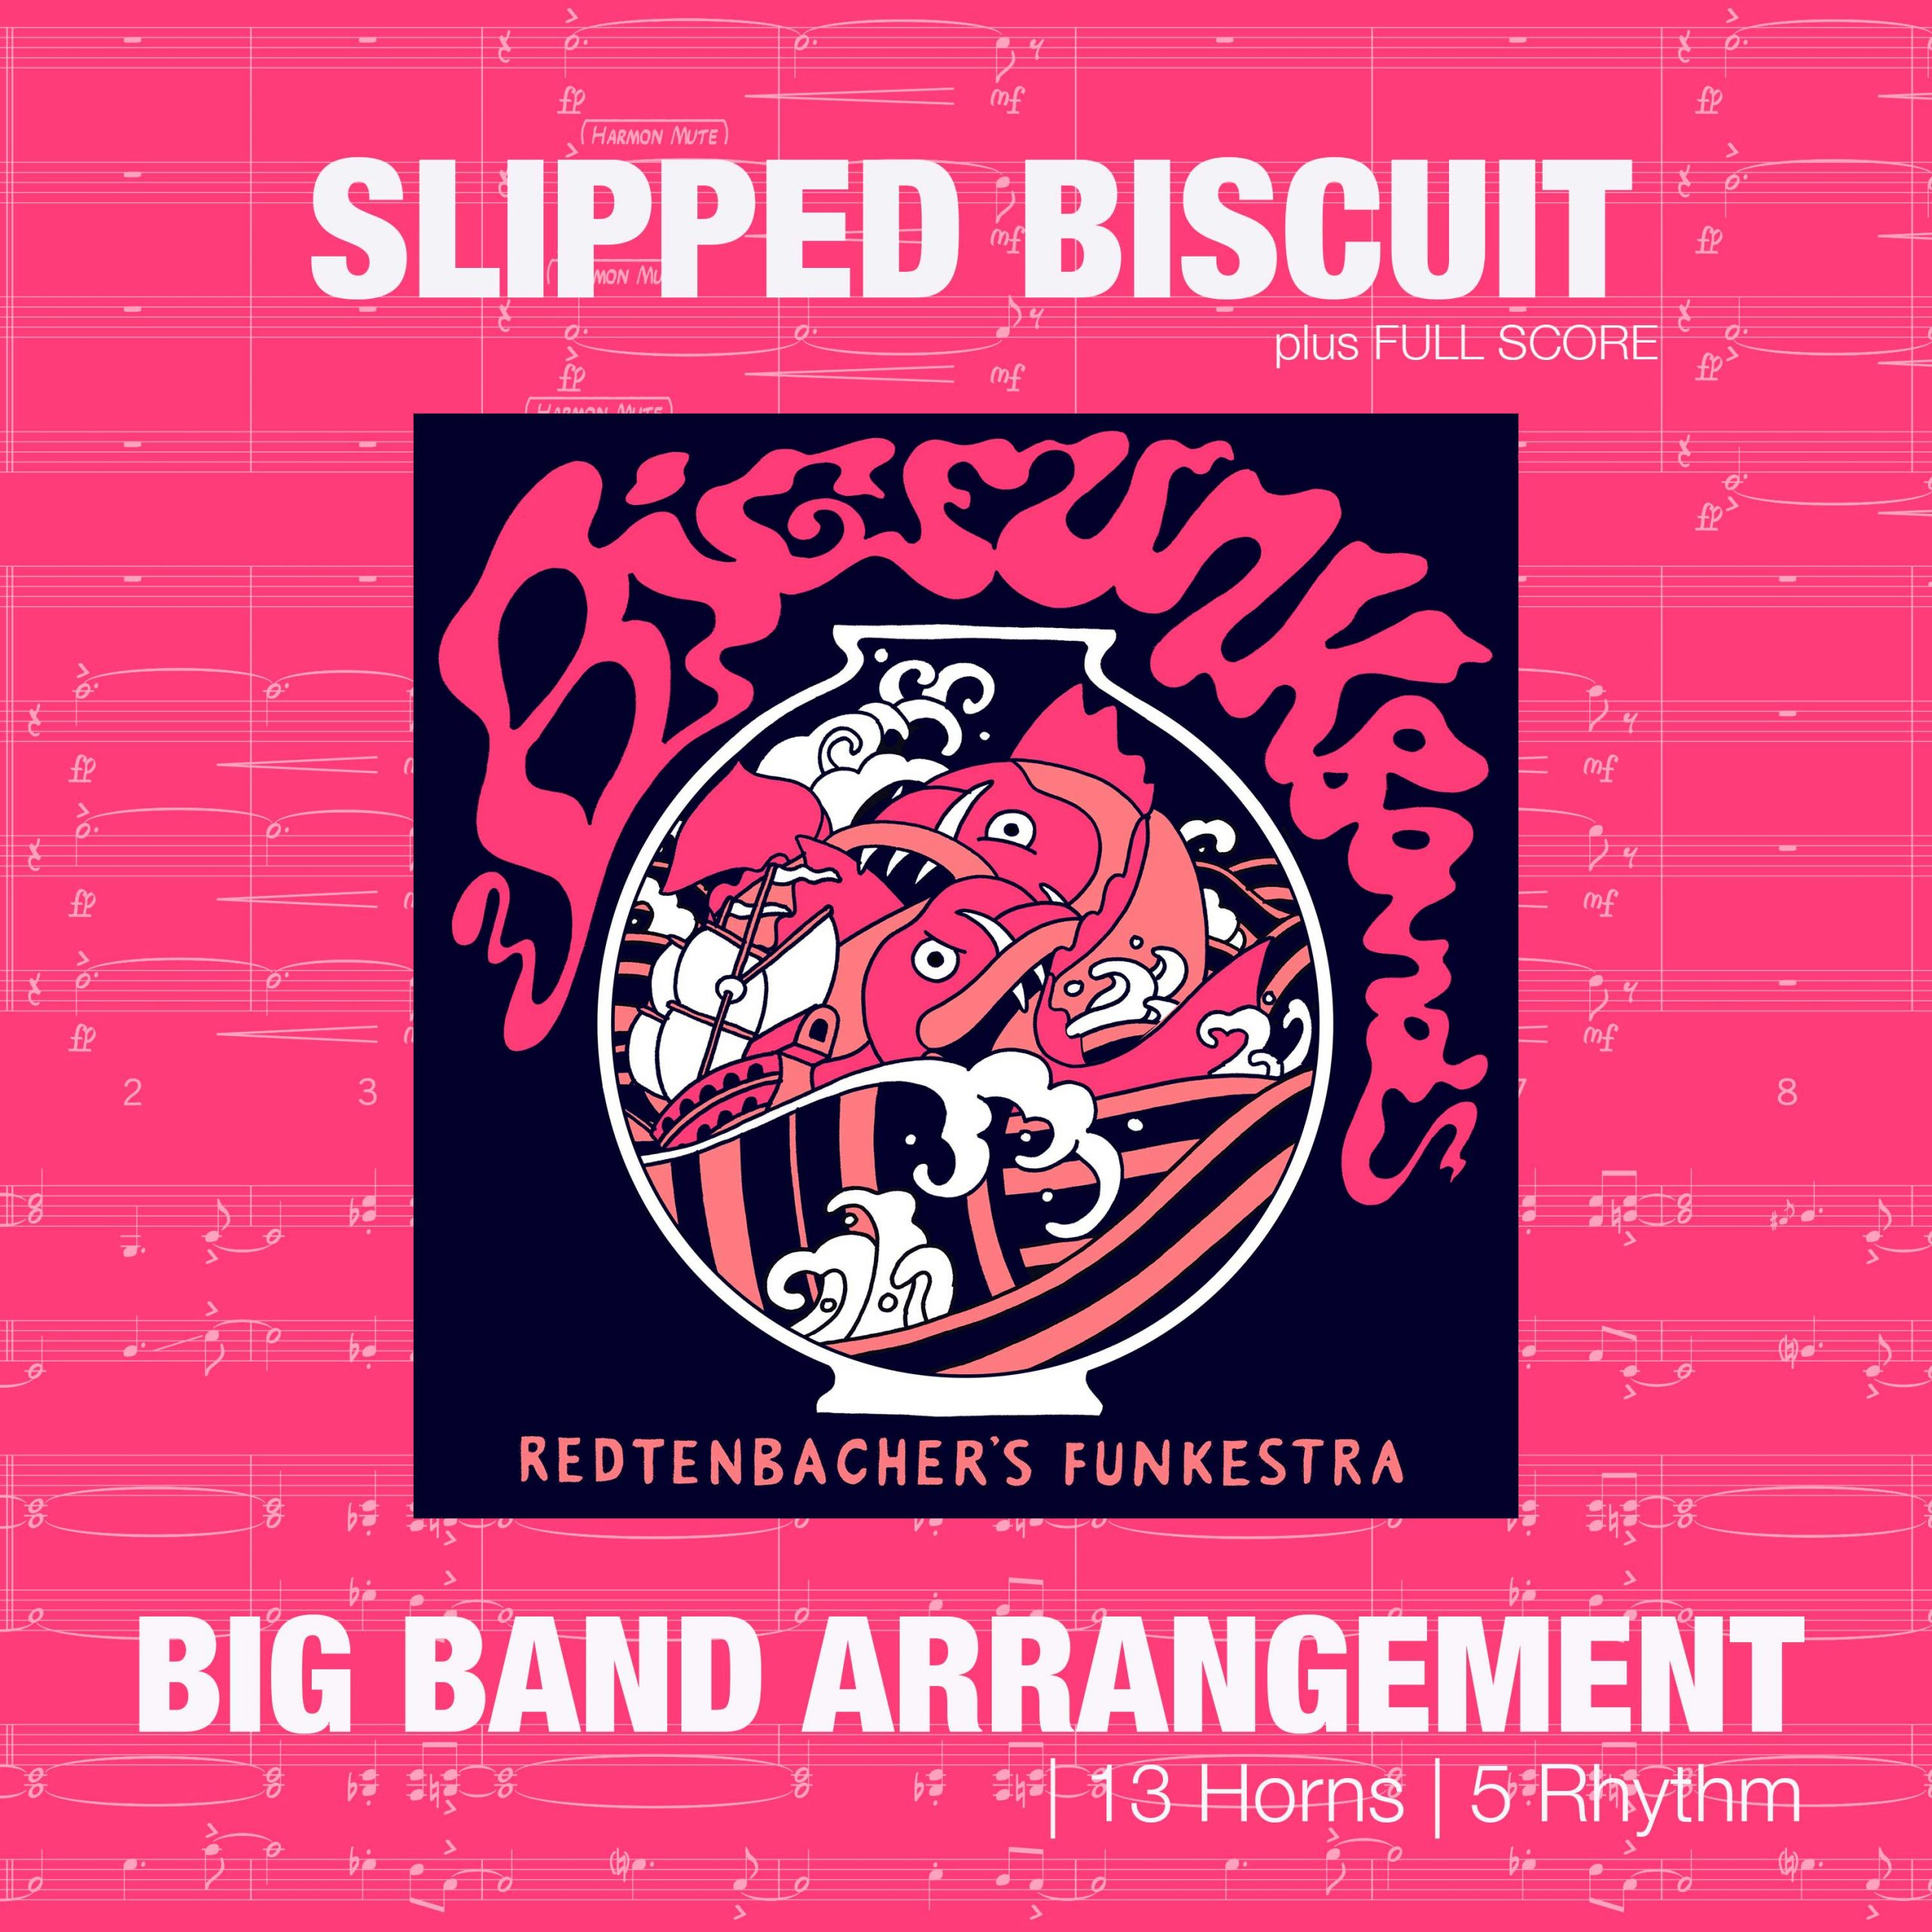 Slipped Biscuit | Big Band Arrangement